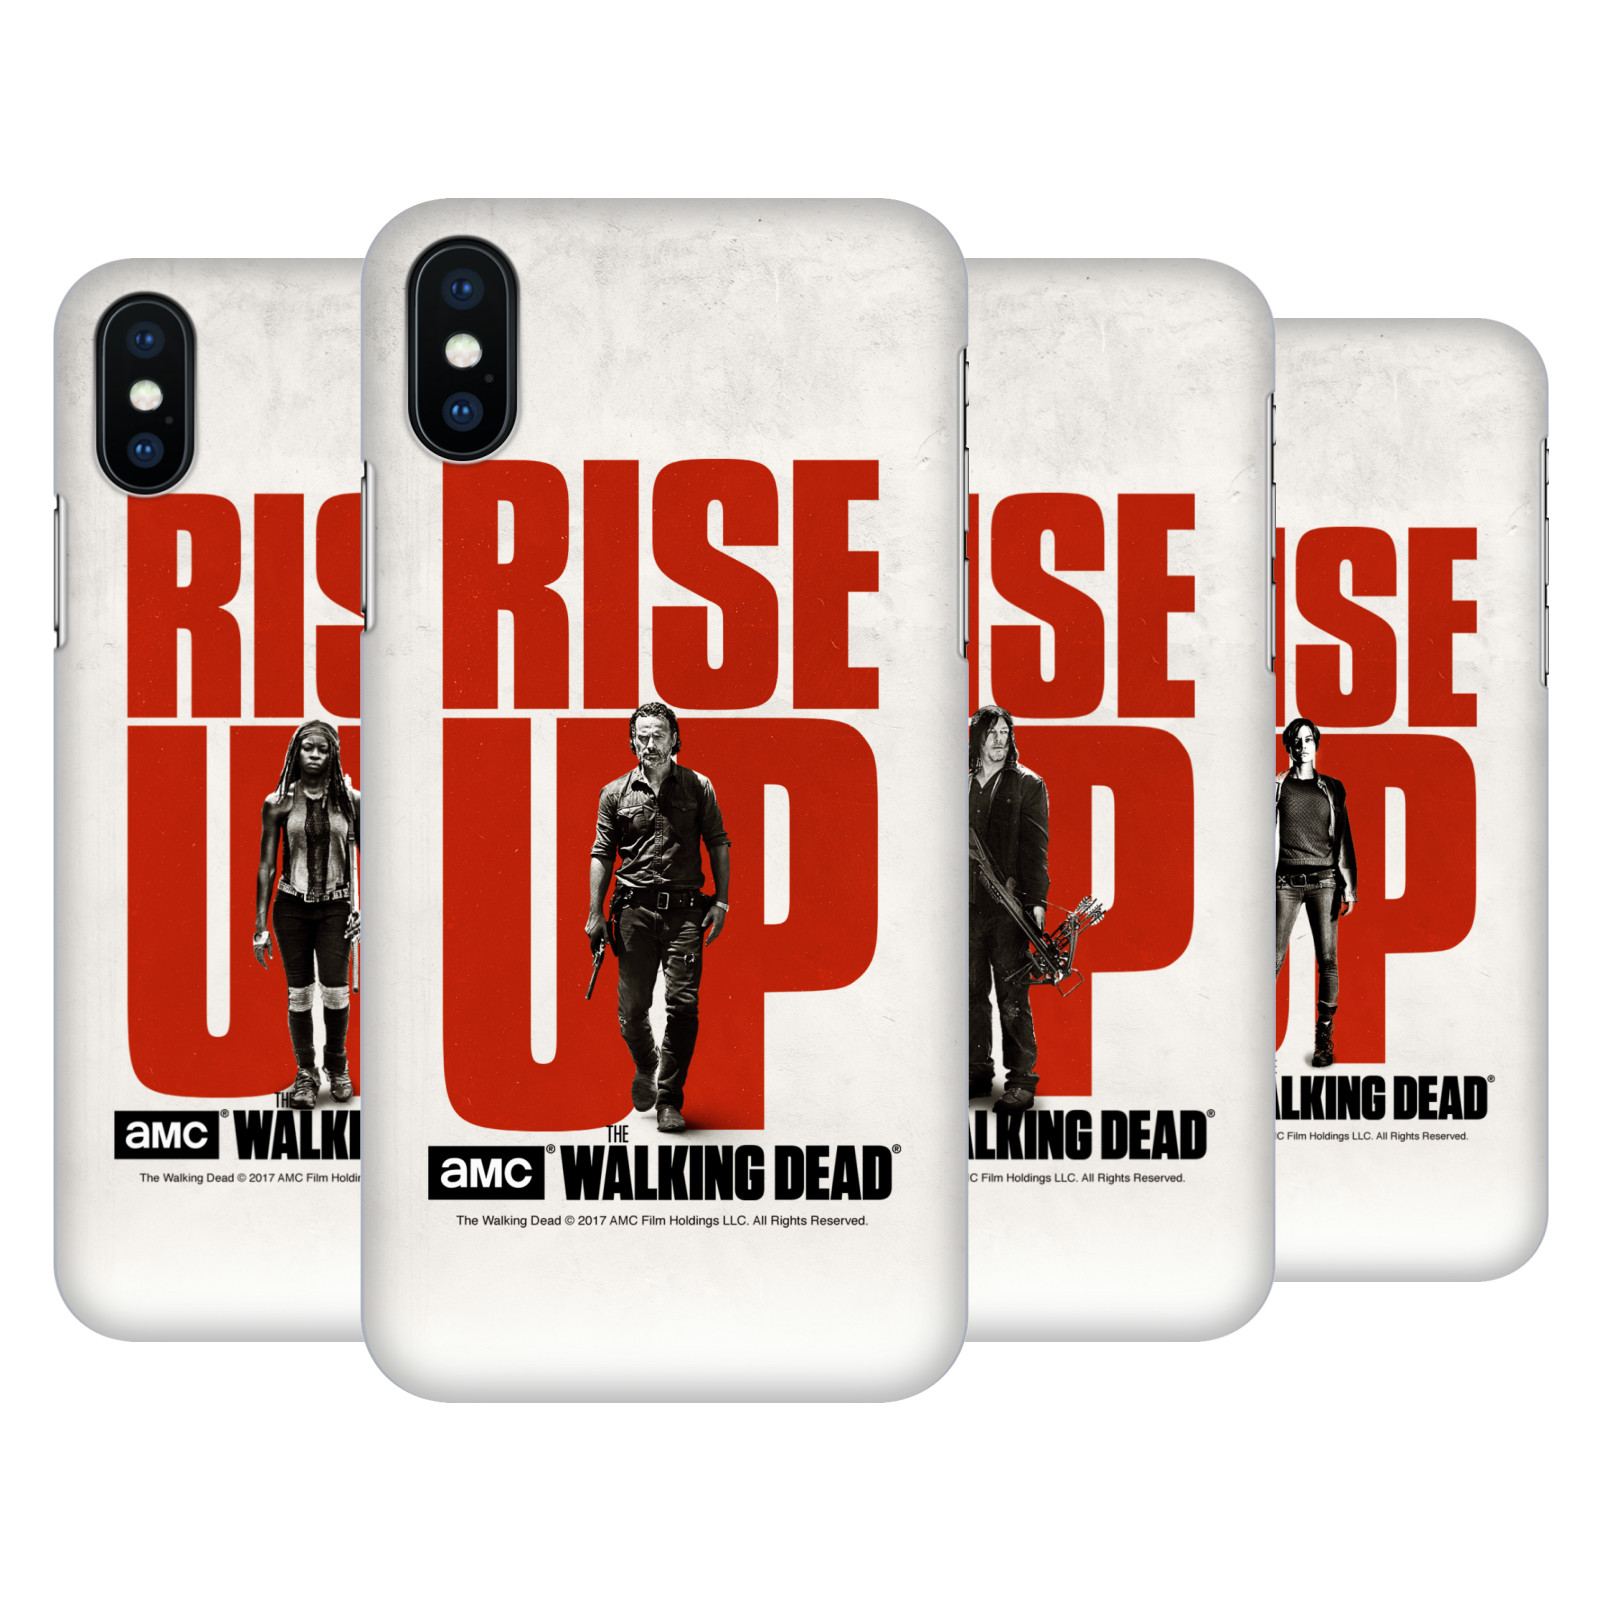 AMC The Walking Dead Rise Up